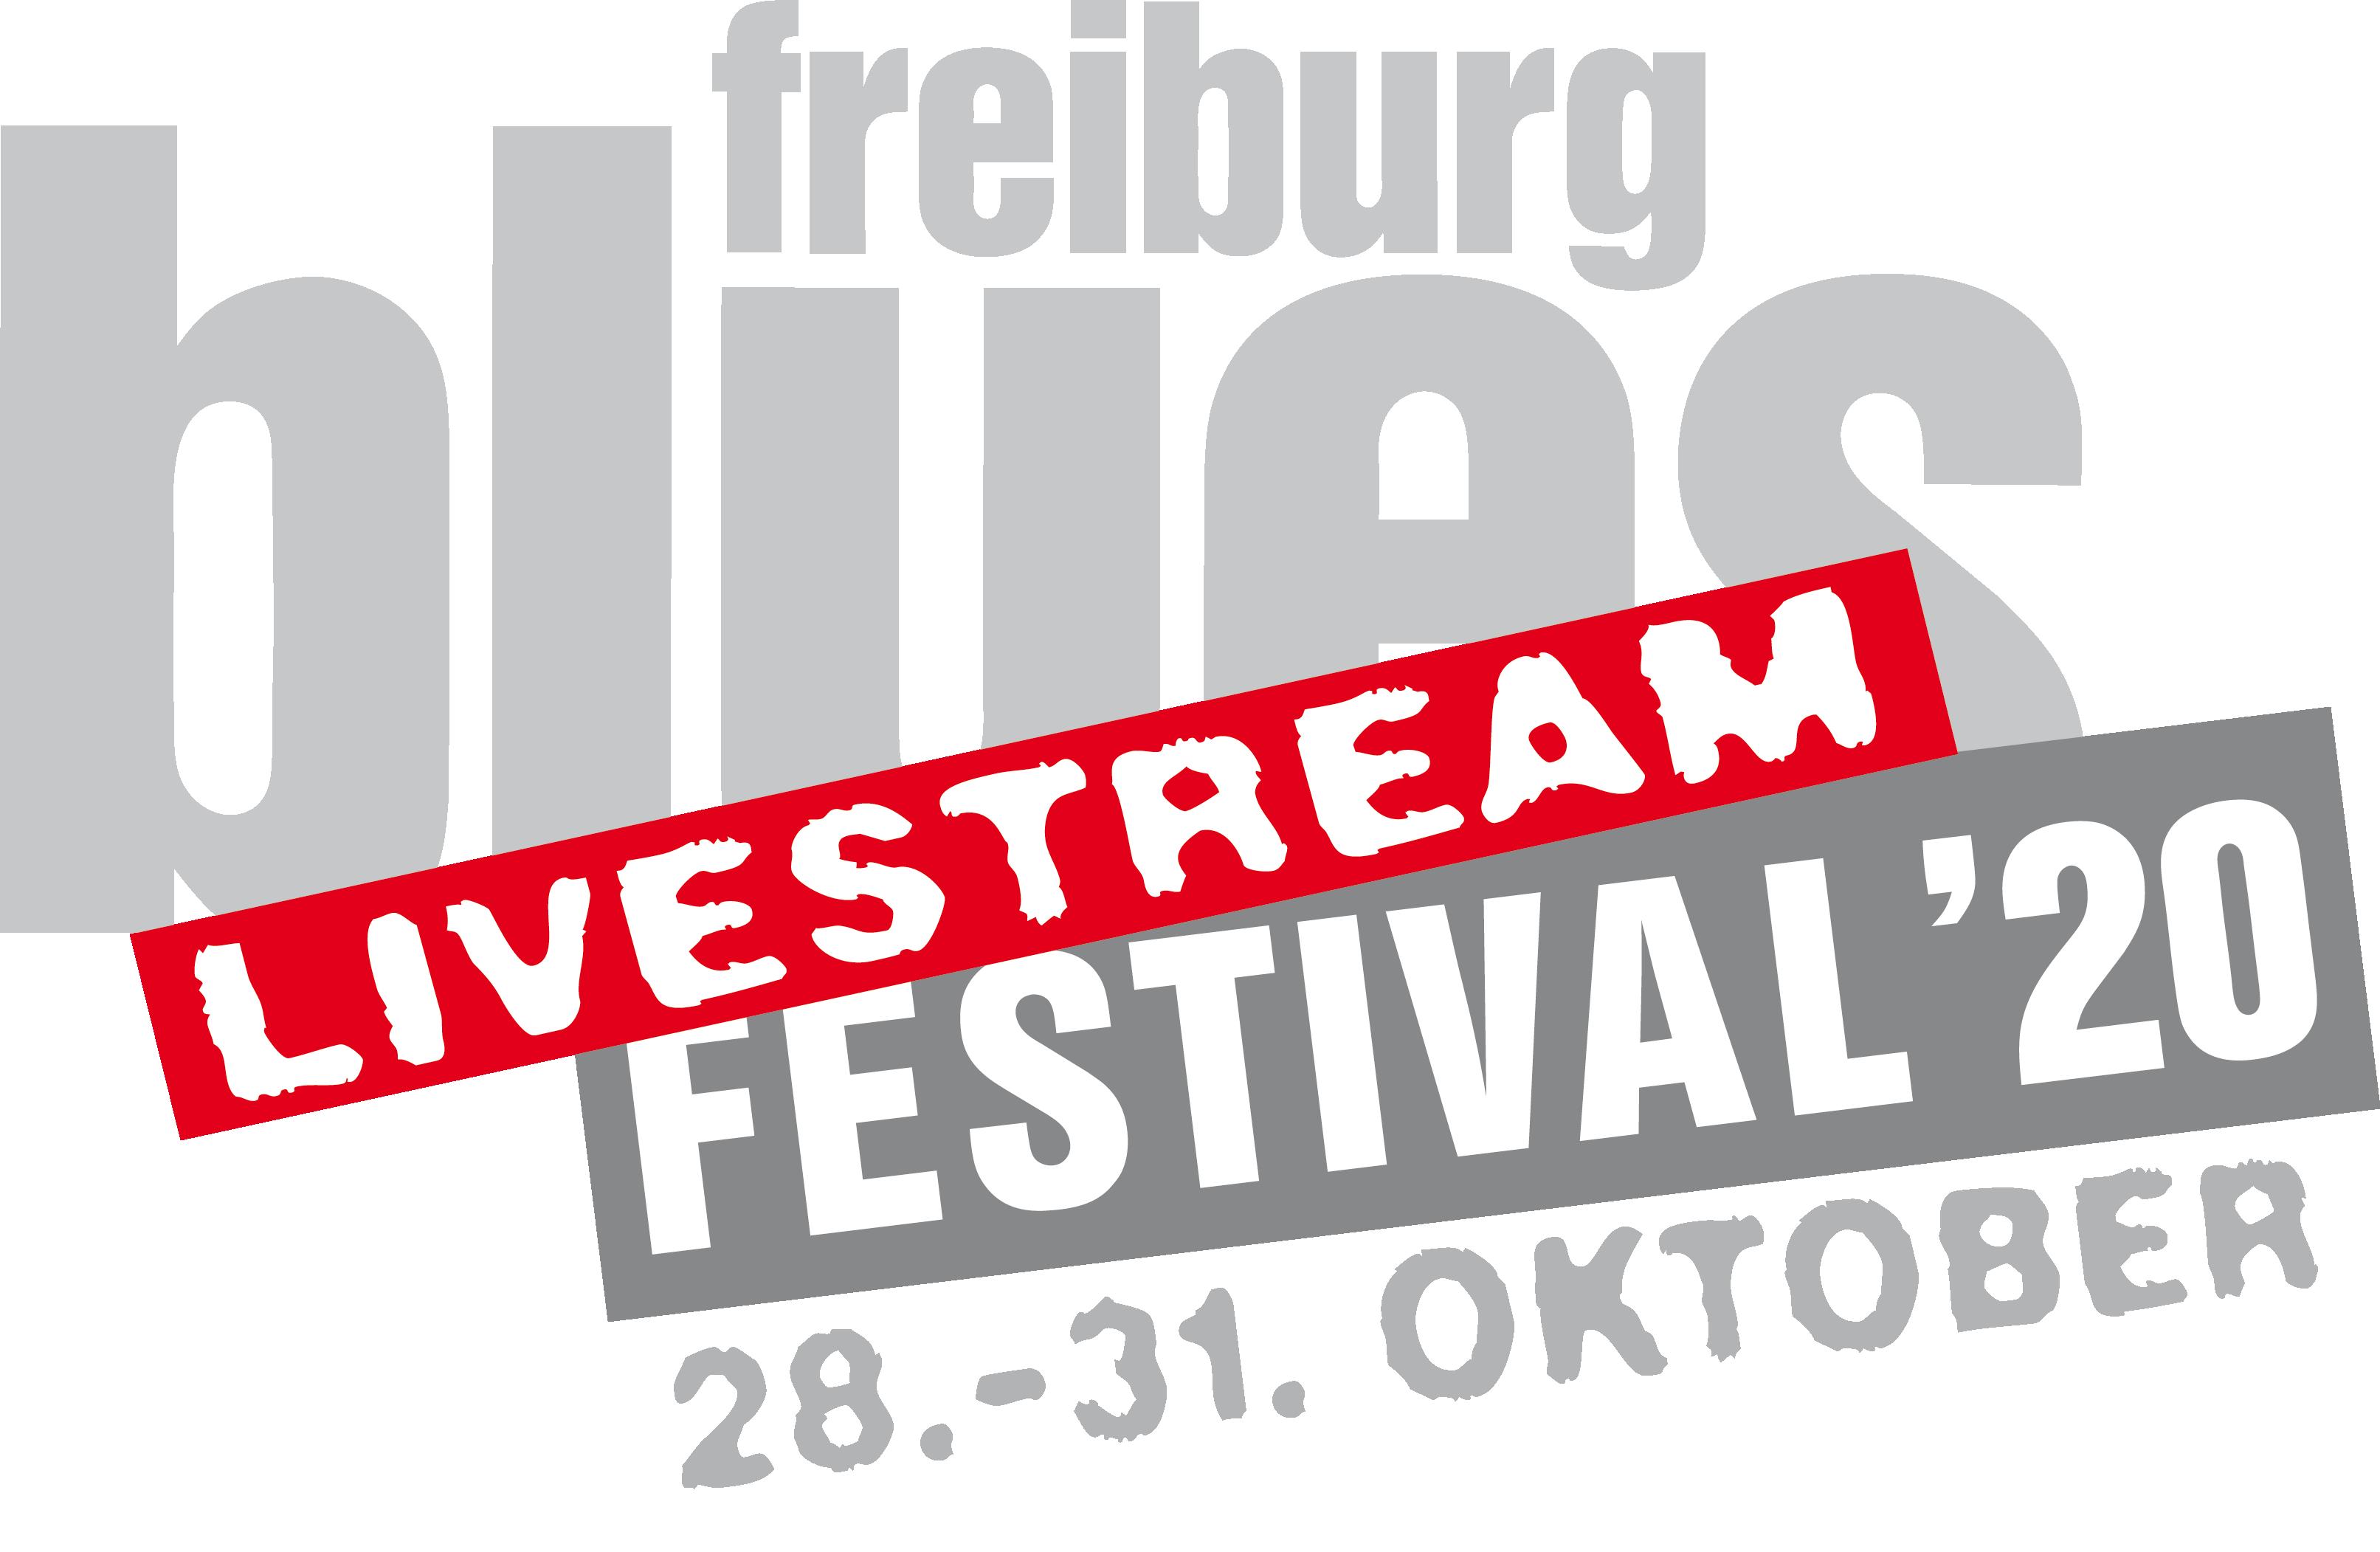 Wodanhalle/Freiburg Livestream Bluesfestival 2020